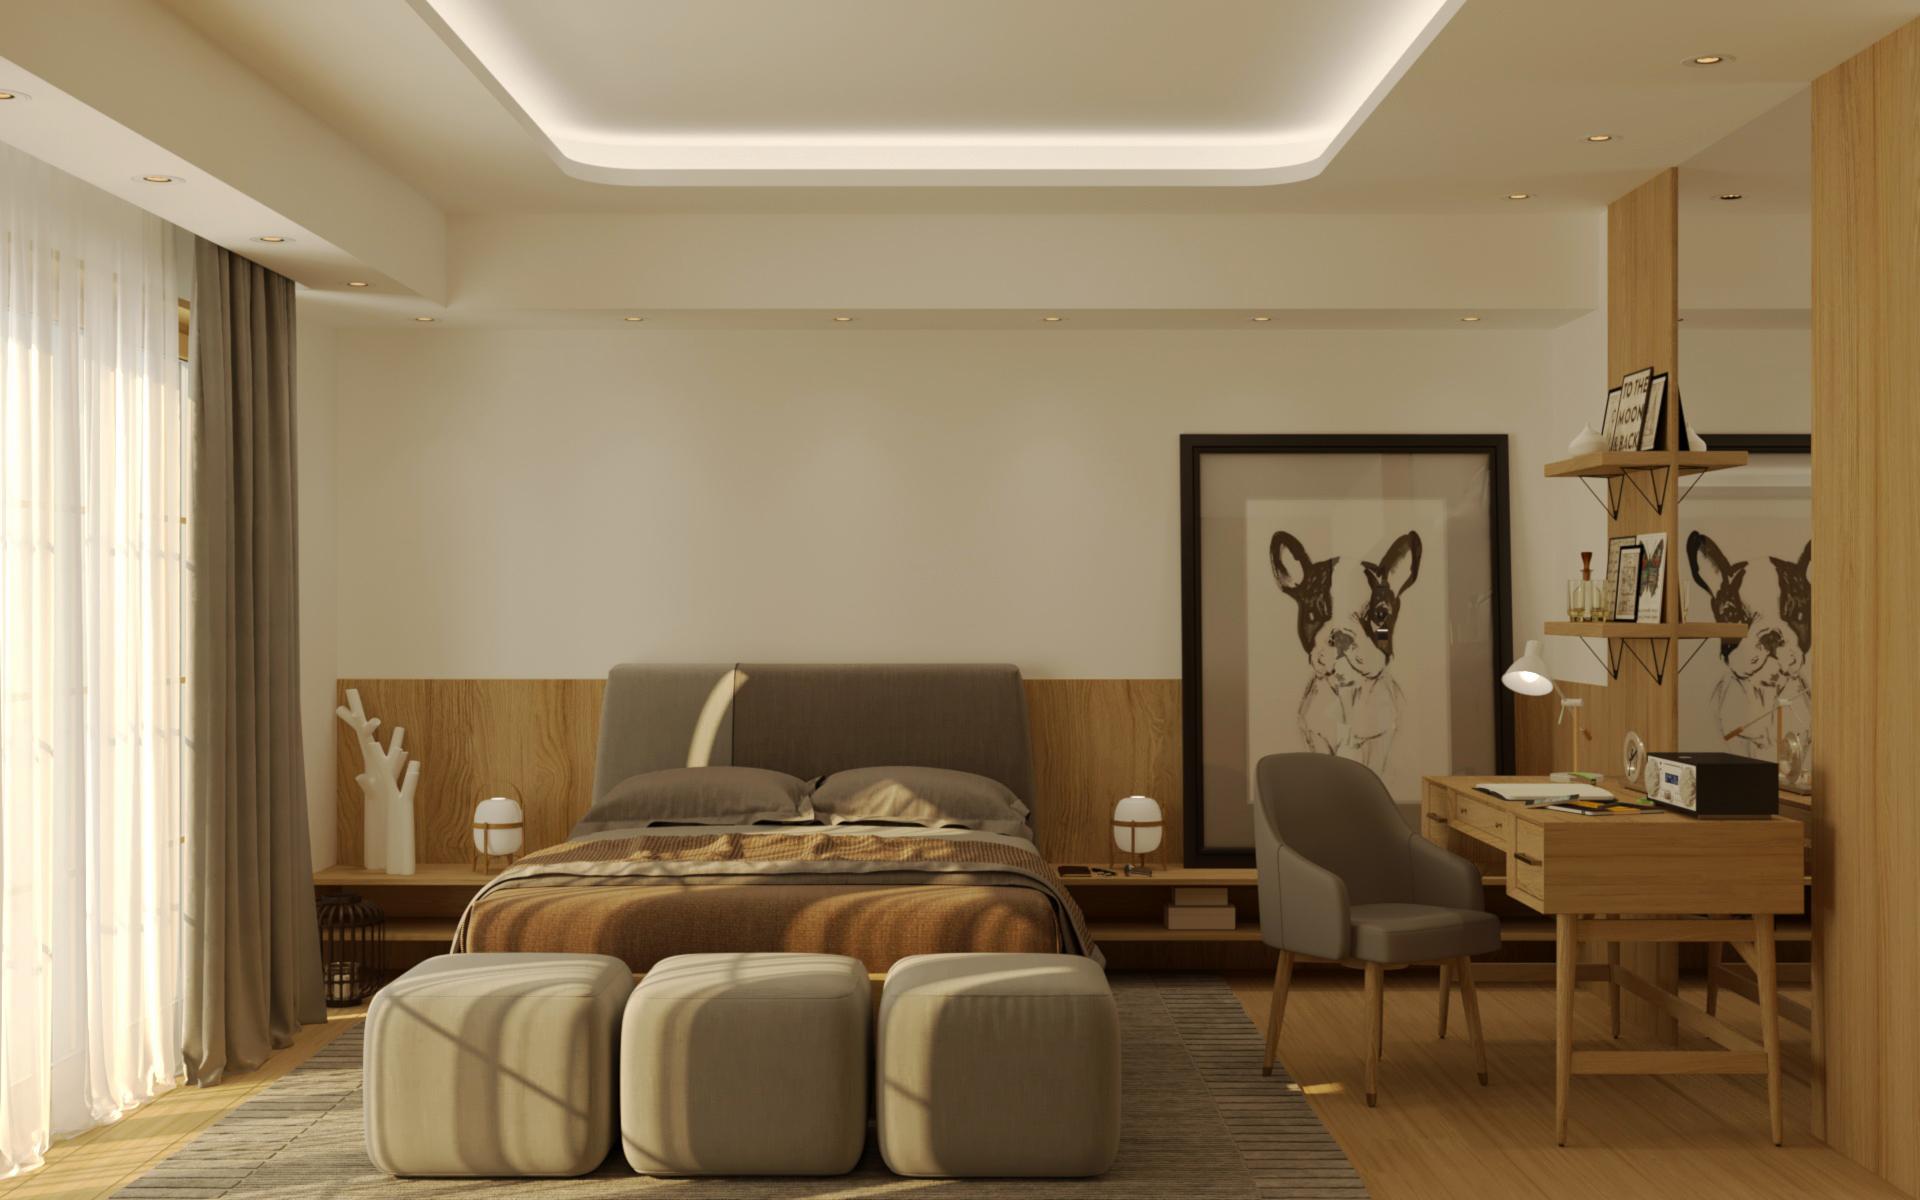 Dormitorio_madera_01